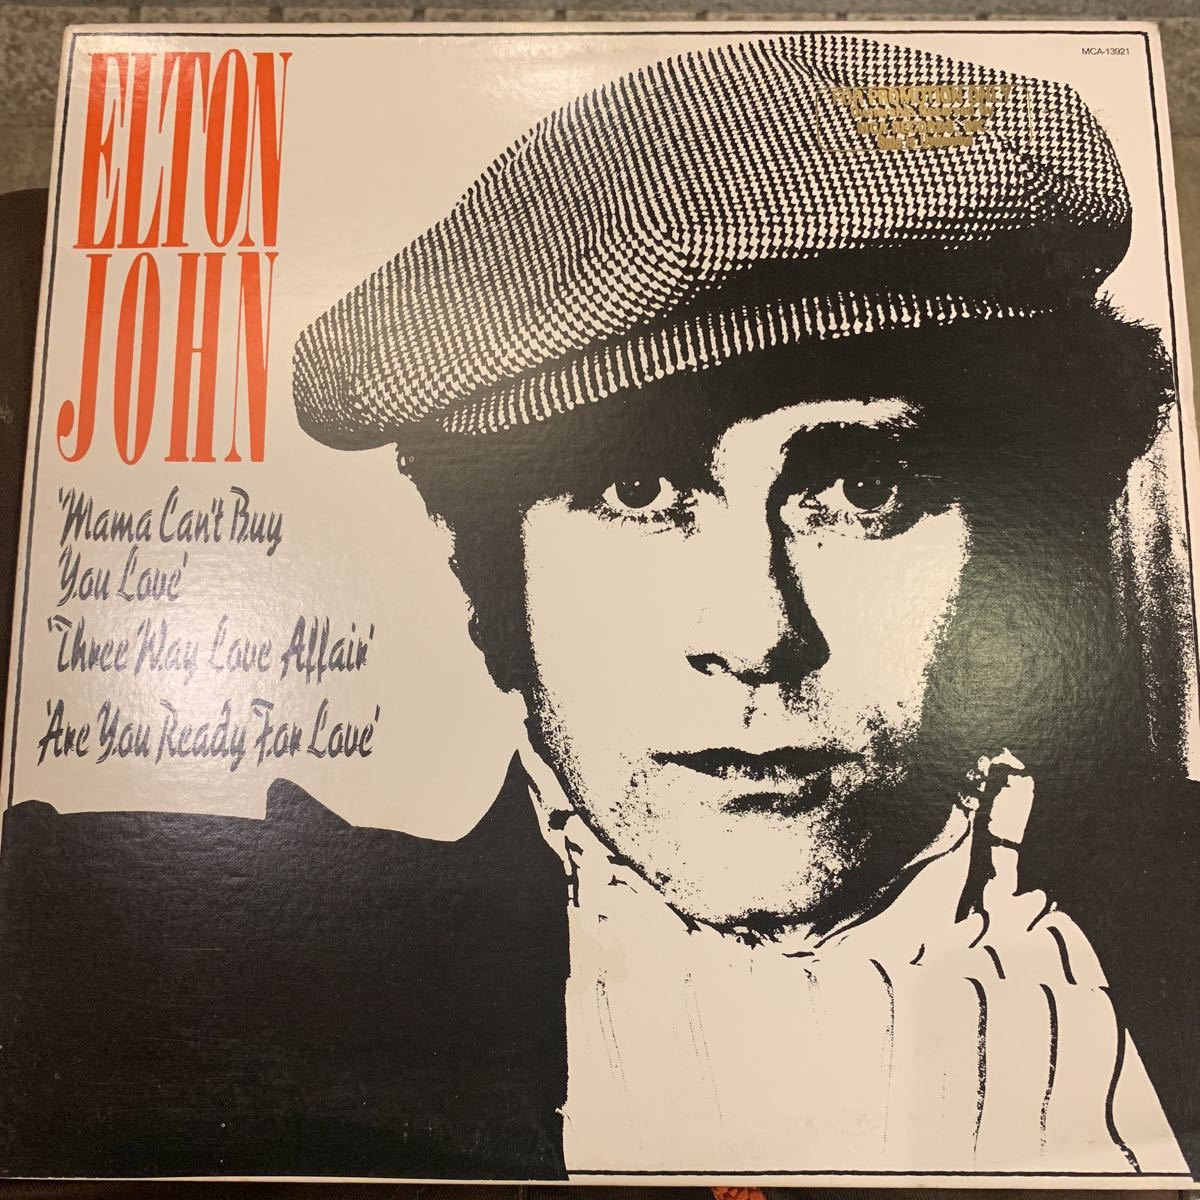 Elton John 「Mama Can't Buy You Love」プロモ盤 中古レコード_画像1